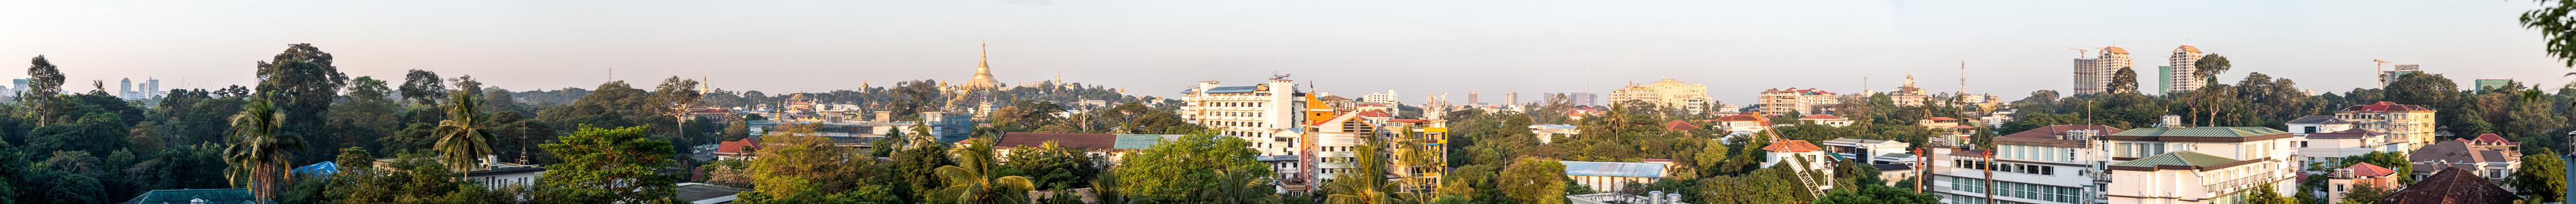 Yangon Blick aus dem Beauty Land Hotel: Shwedagon-Pagode und Umgebung